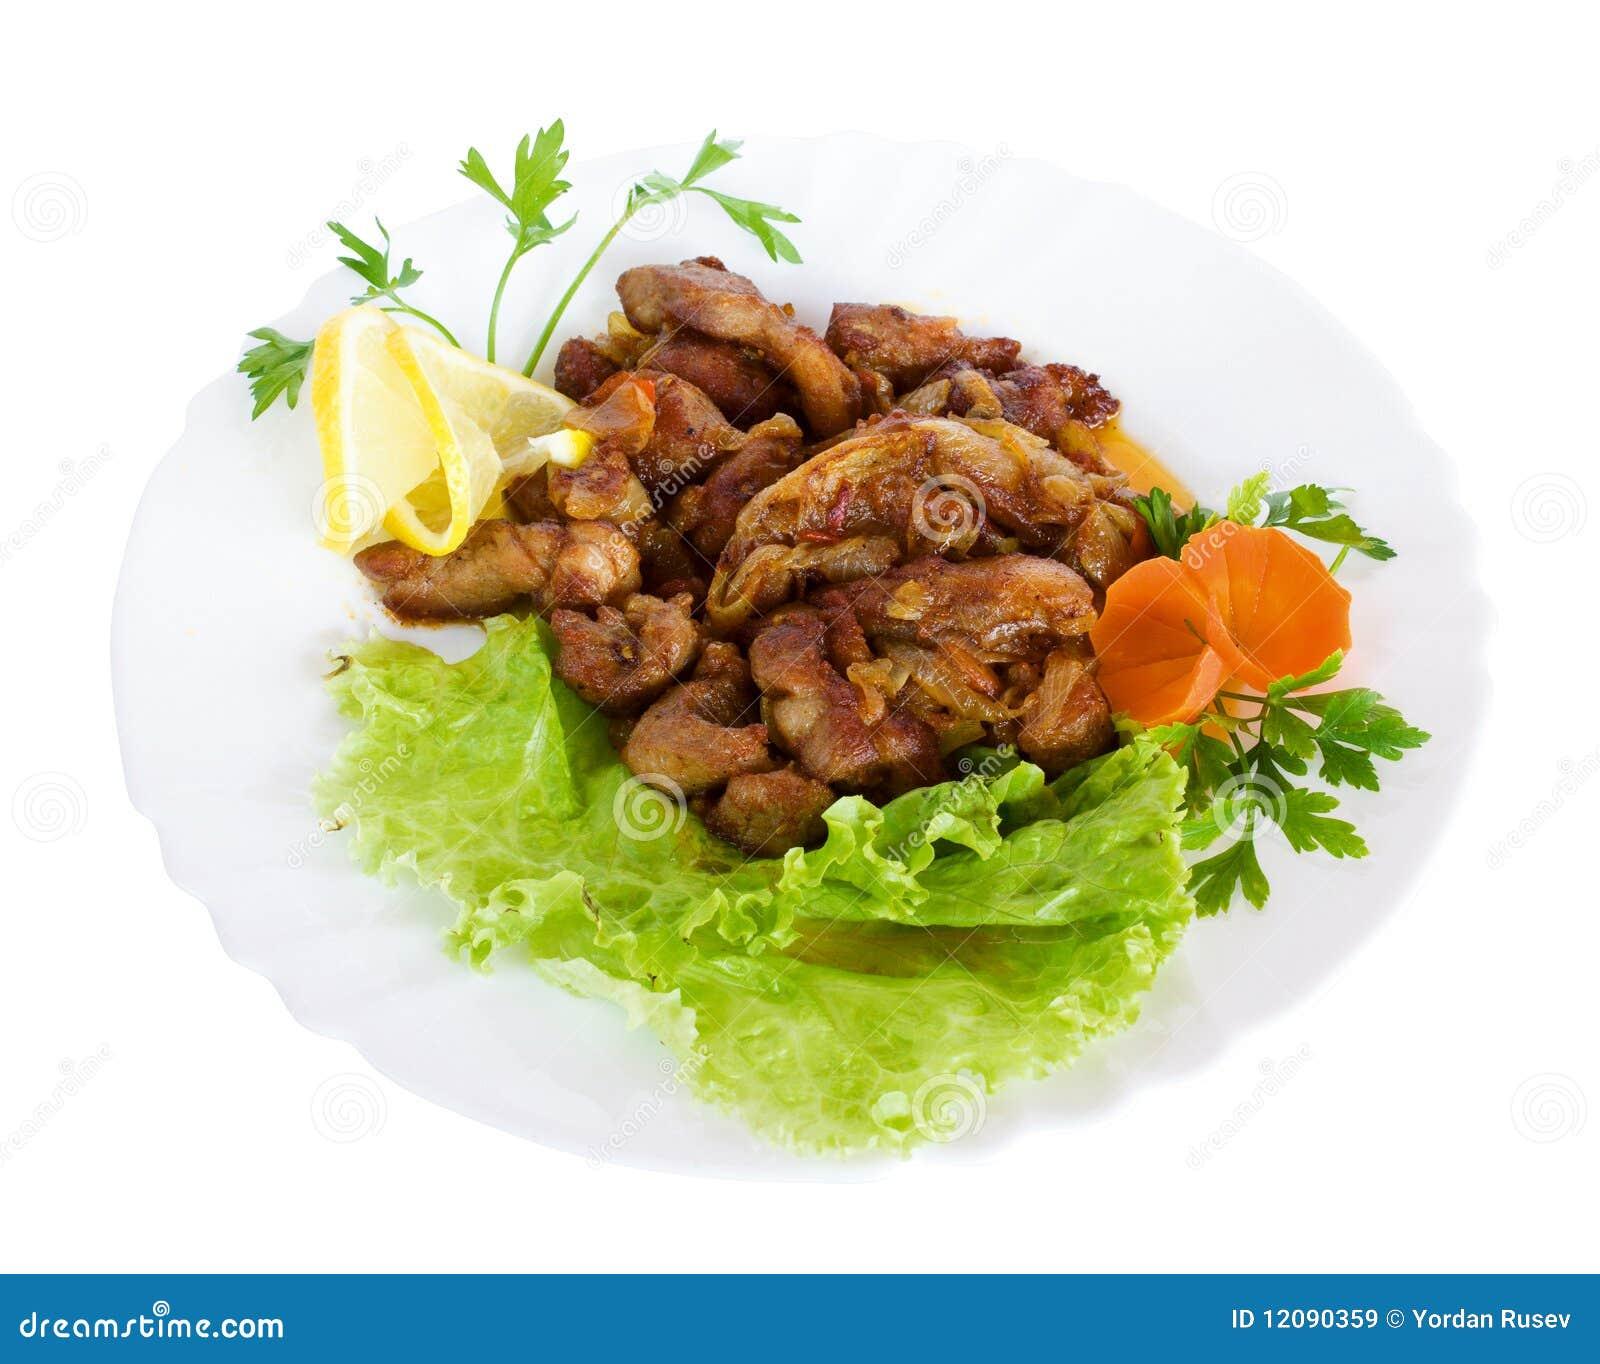 Gourmet food with salad